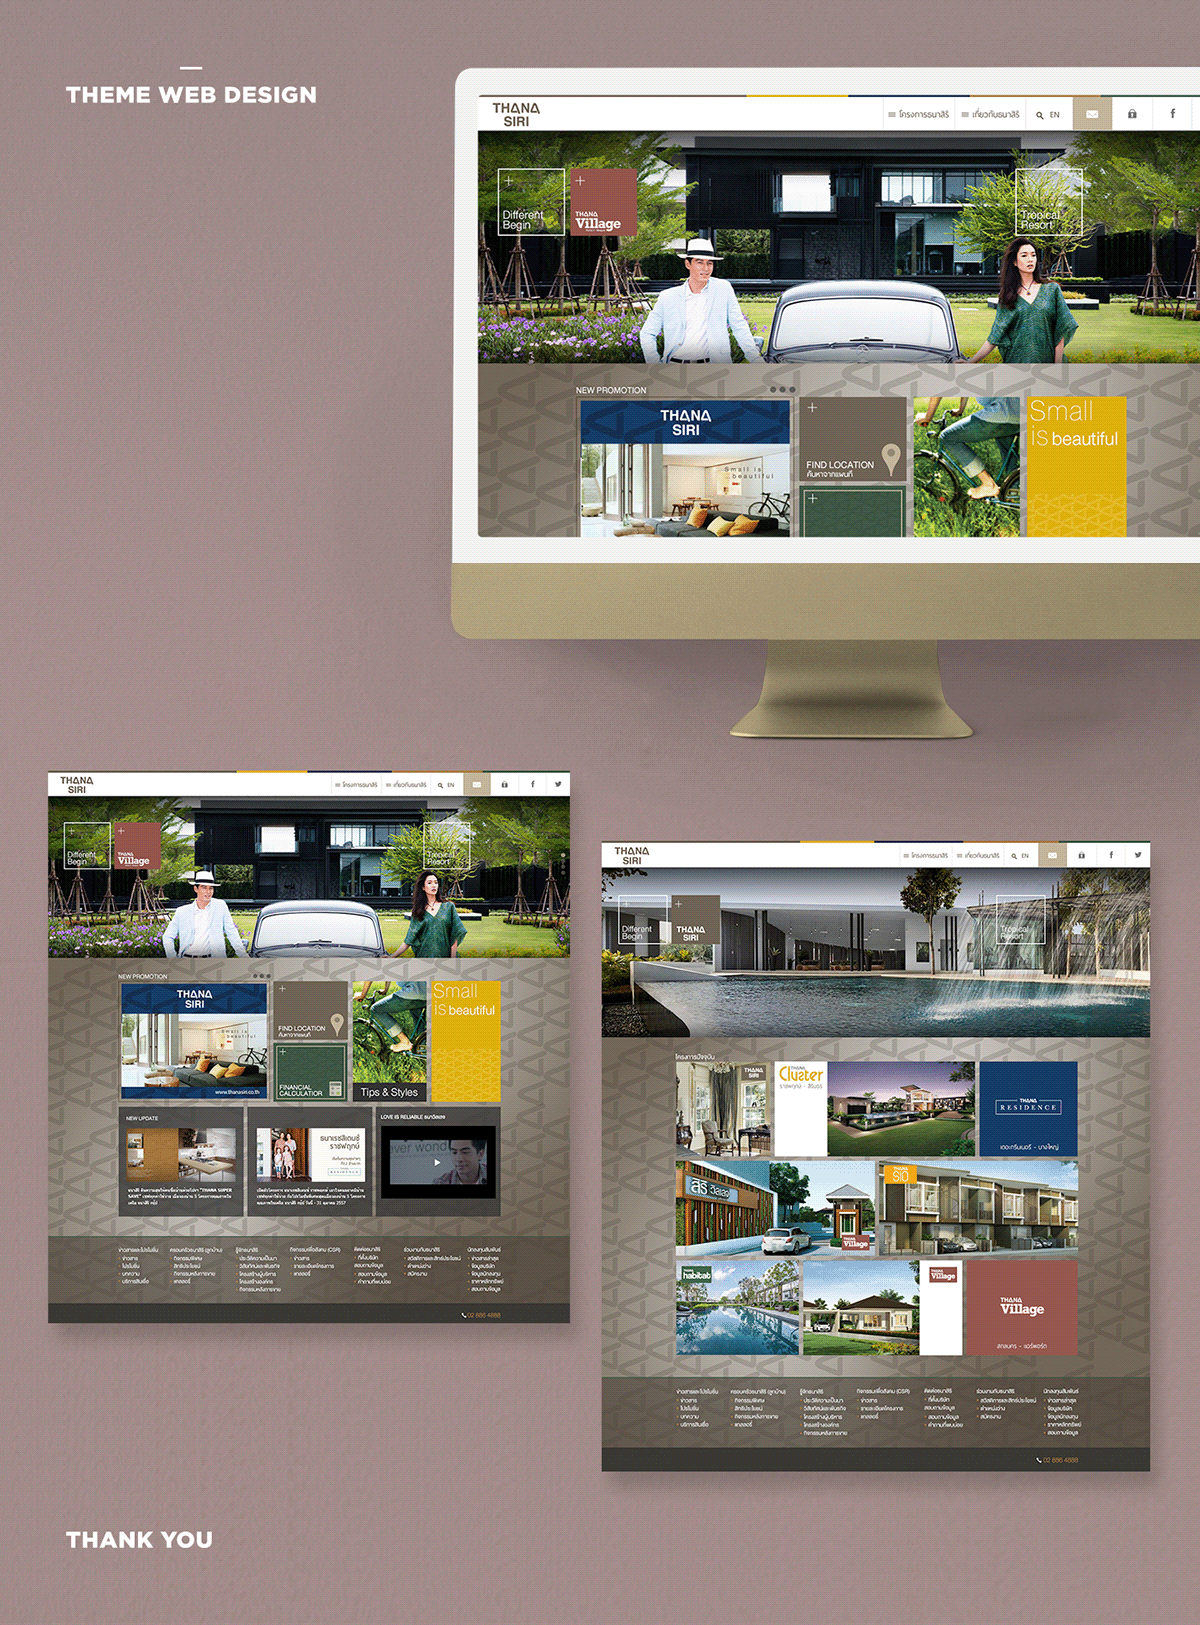 Theme design for website